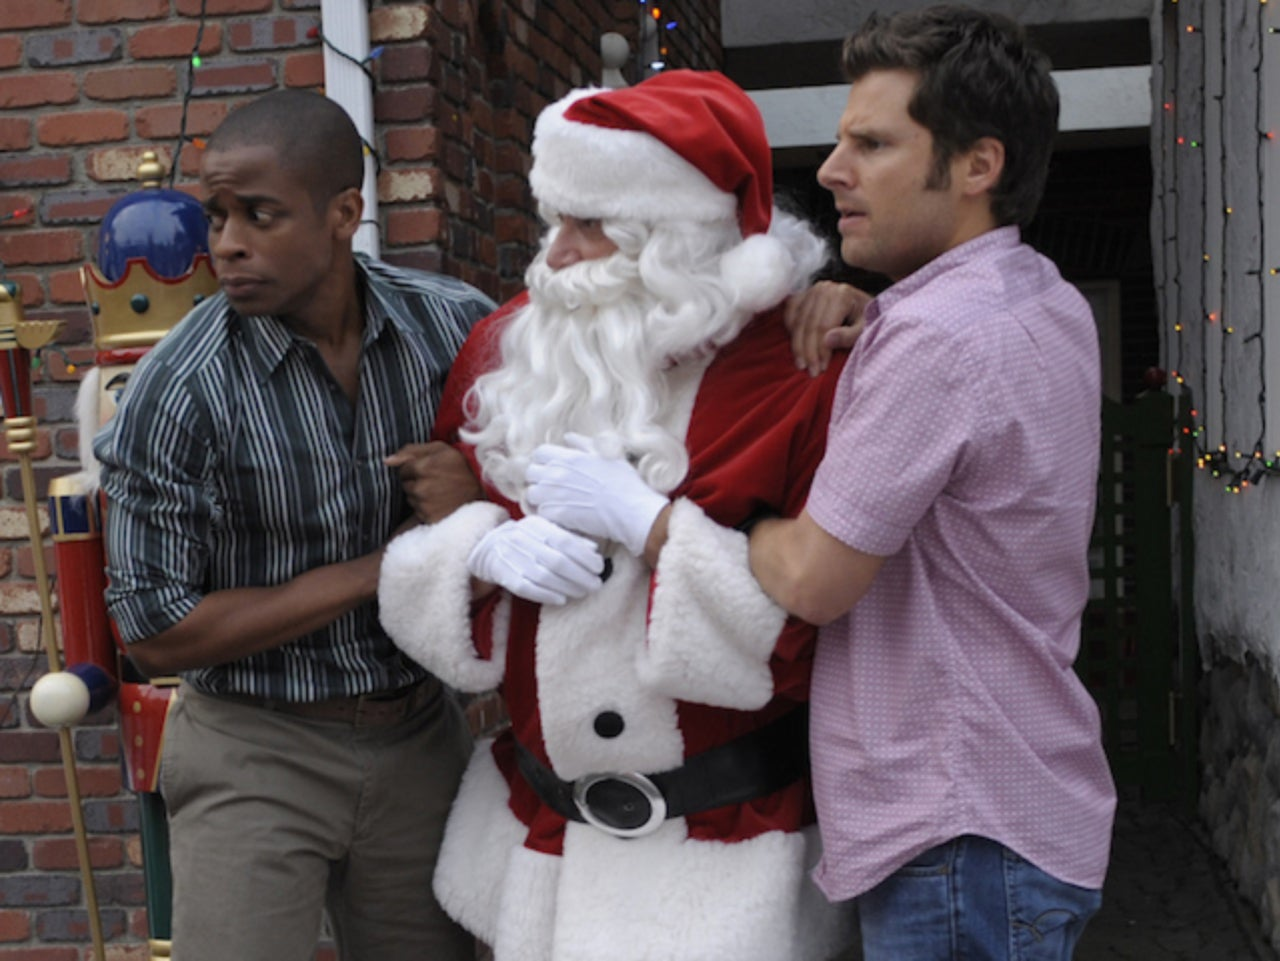 Psych Holiday Reunion Movie Set at USA